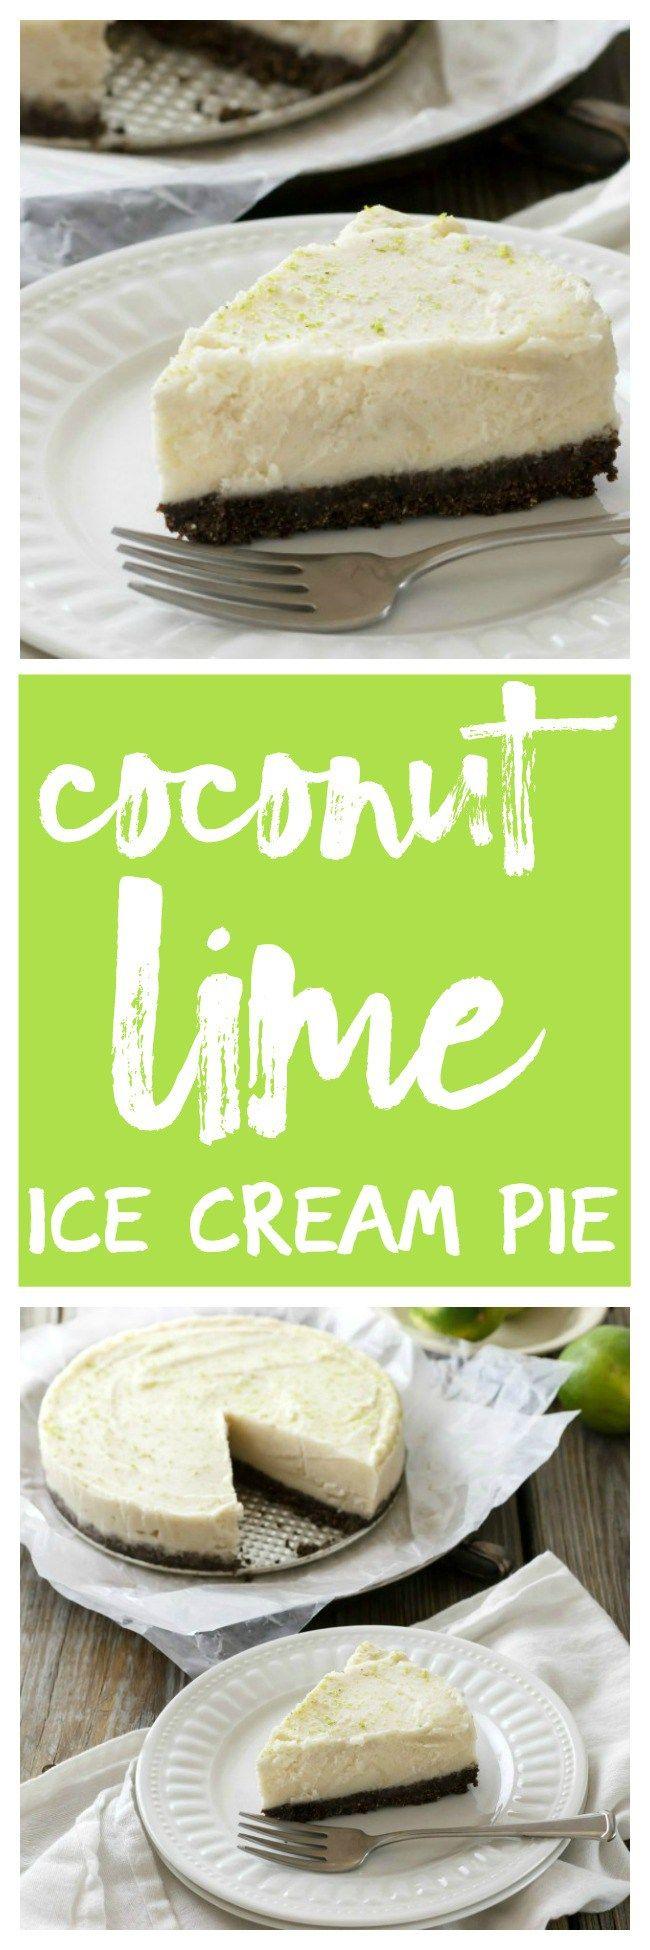 ... on Pinterest | Strawberry frozen yogurt, Ice cream cakes and Popsicles